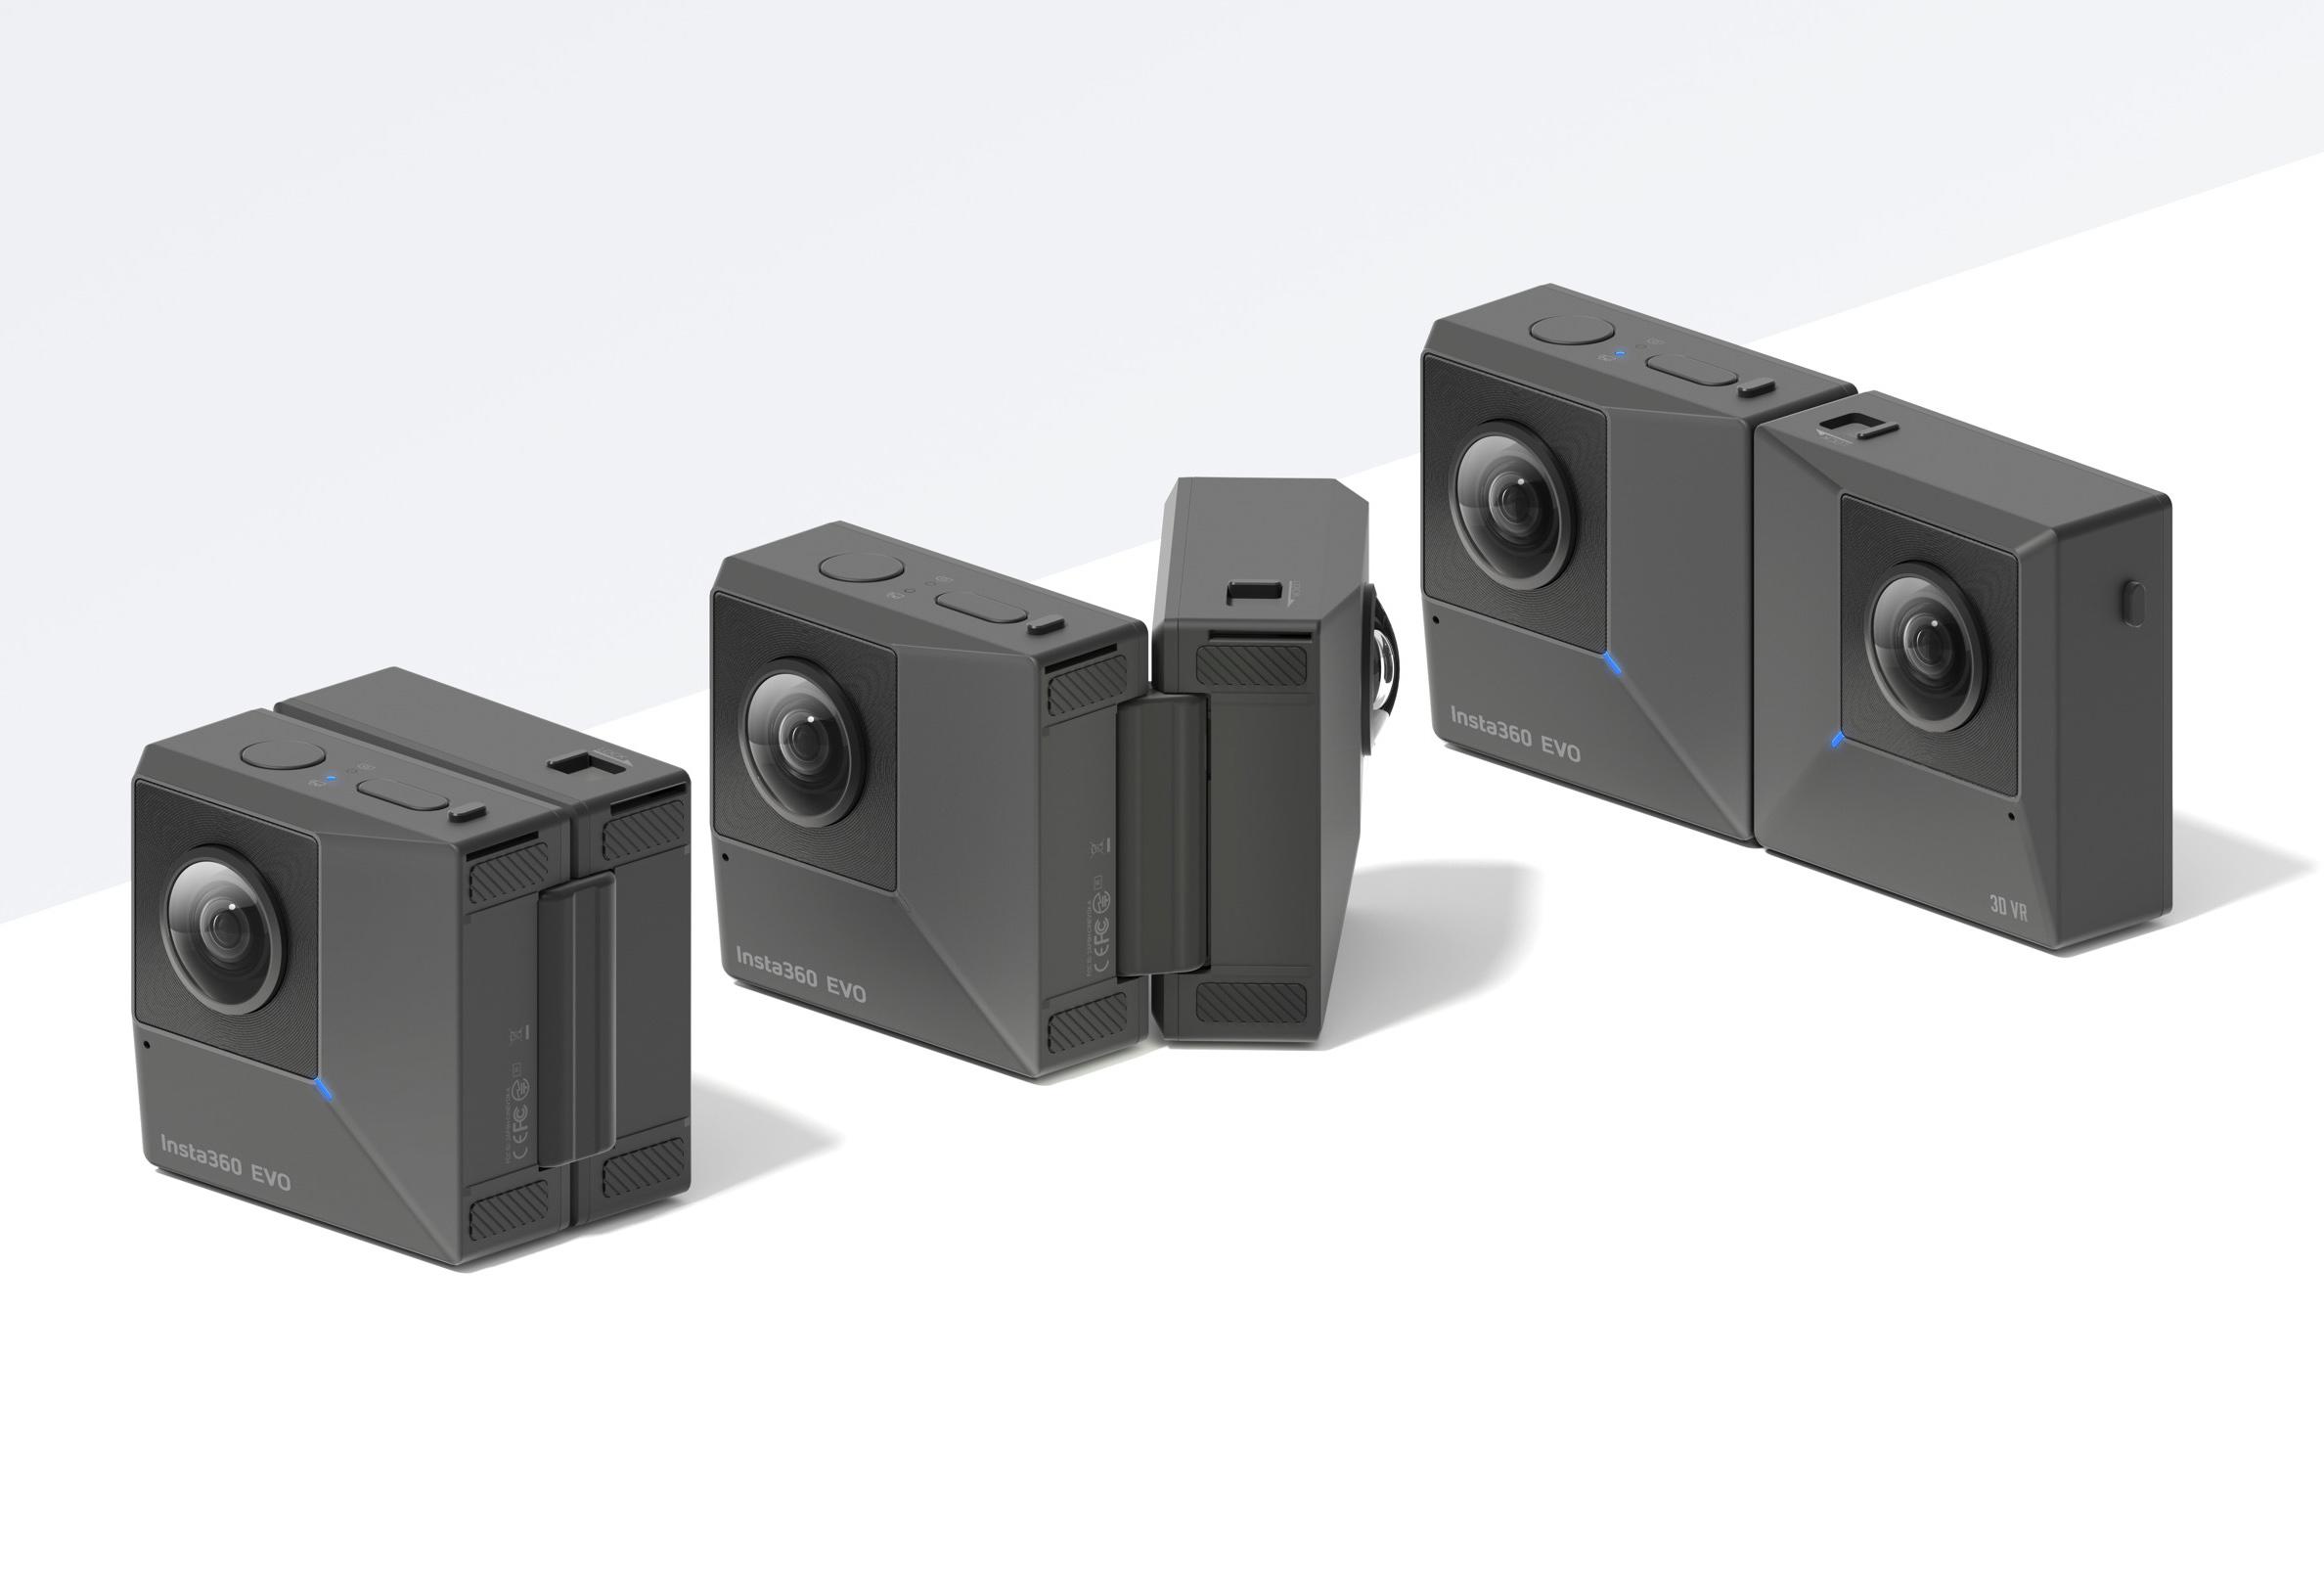 Meet the Insta360 EVO, a foldable camera that shoots 3D 180º